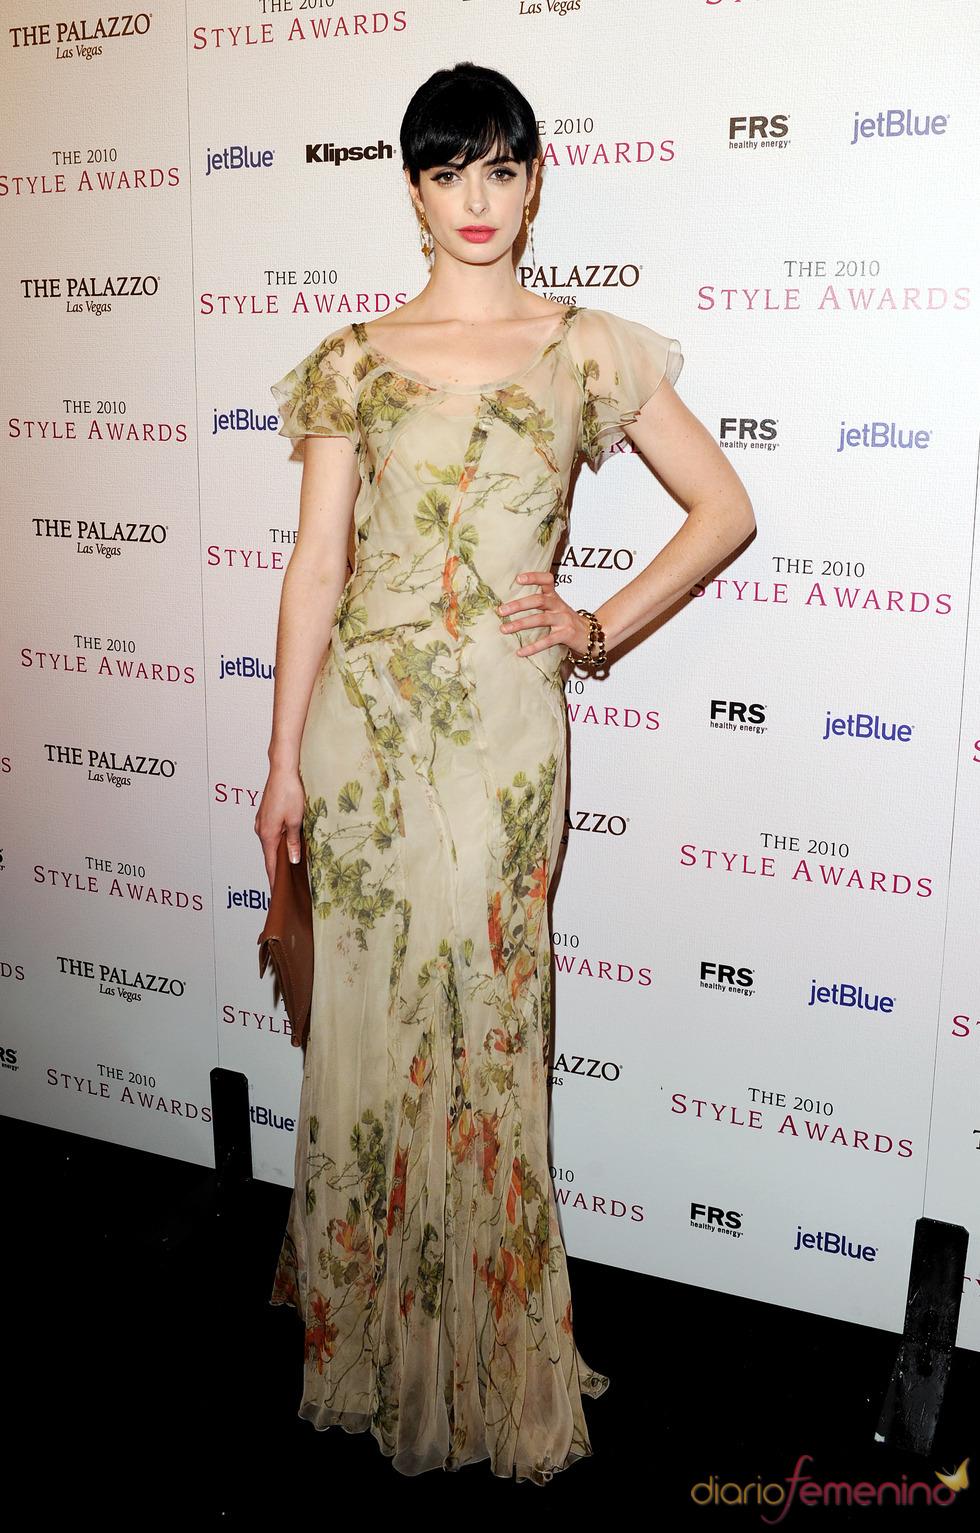 Krysten Ritter en los Premios Hollywood Style 2010